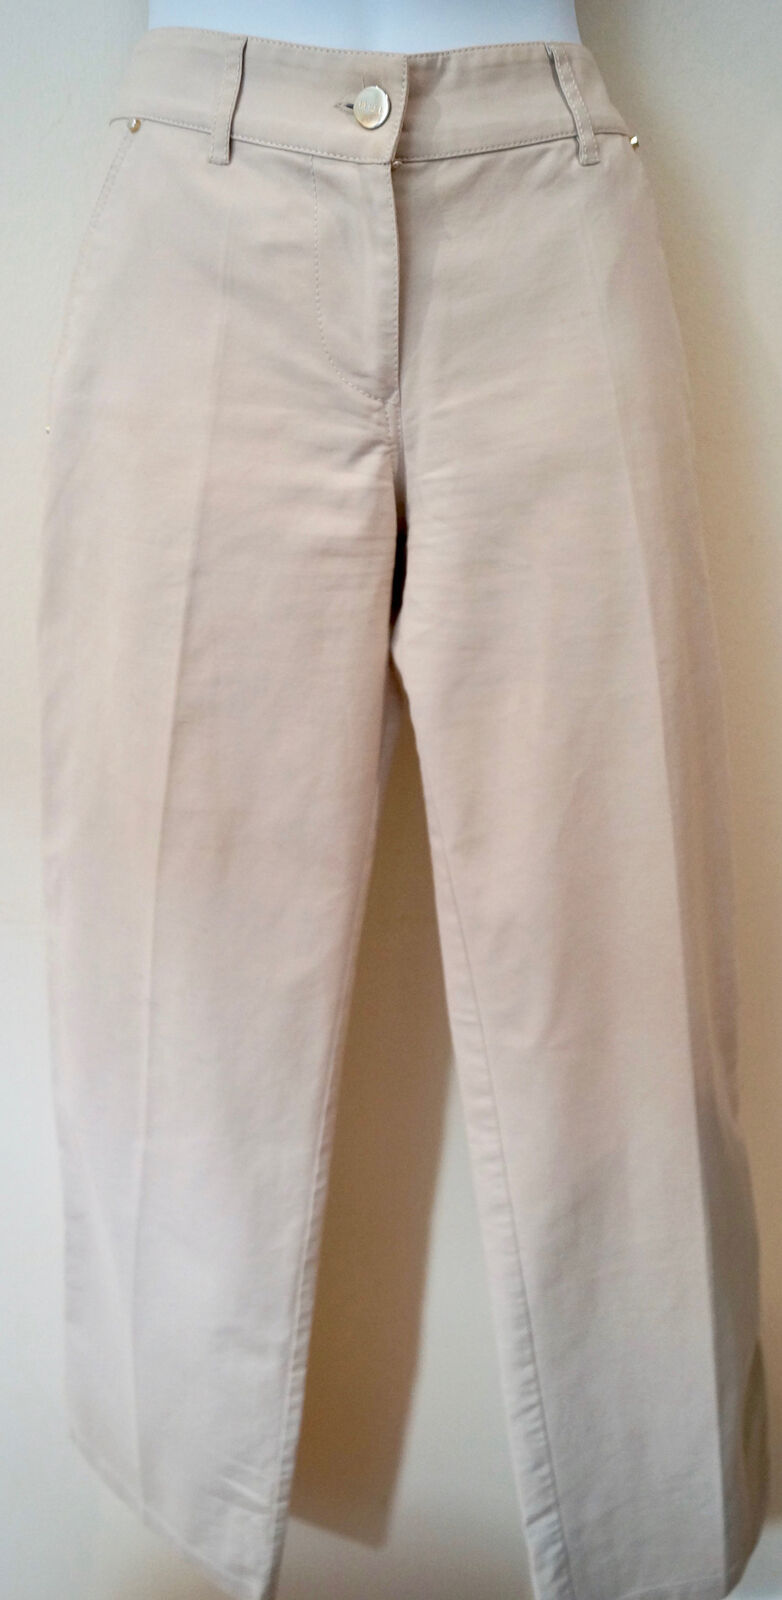 Bui DE Barbara Barbara Barbara Bui donna Beige Cotone Casual Stretch Pantaloni Pants XS 5f01c8